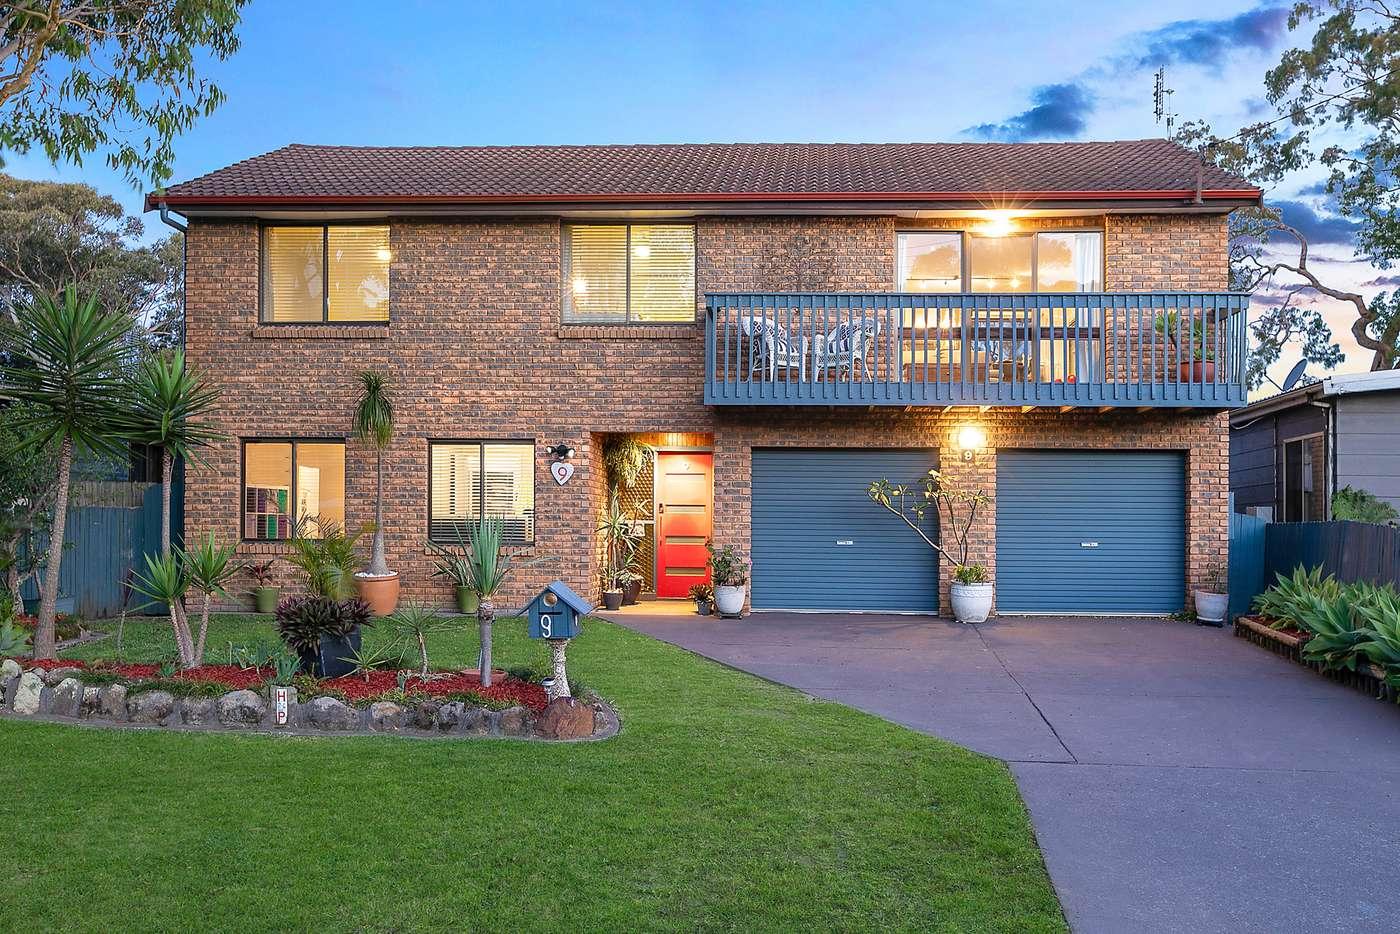 Main view of Homely house listing, 9 Kalele Avenue, Halekulani NSW 2262